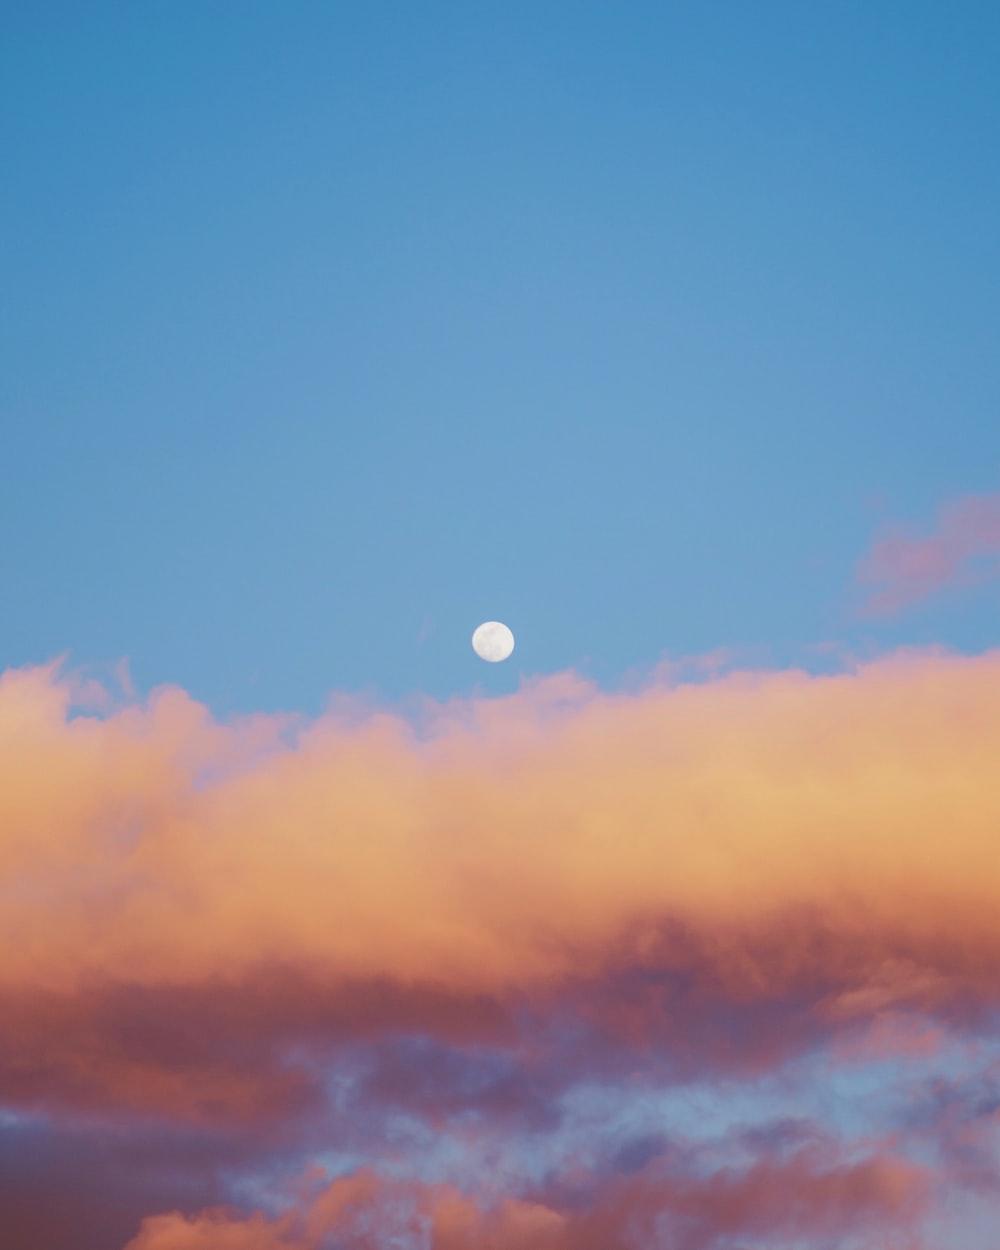 moon under blue sky